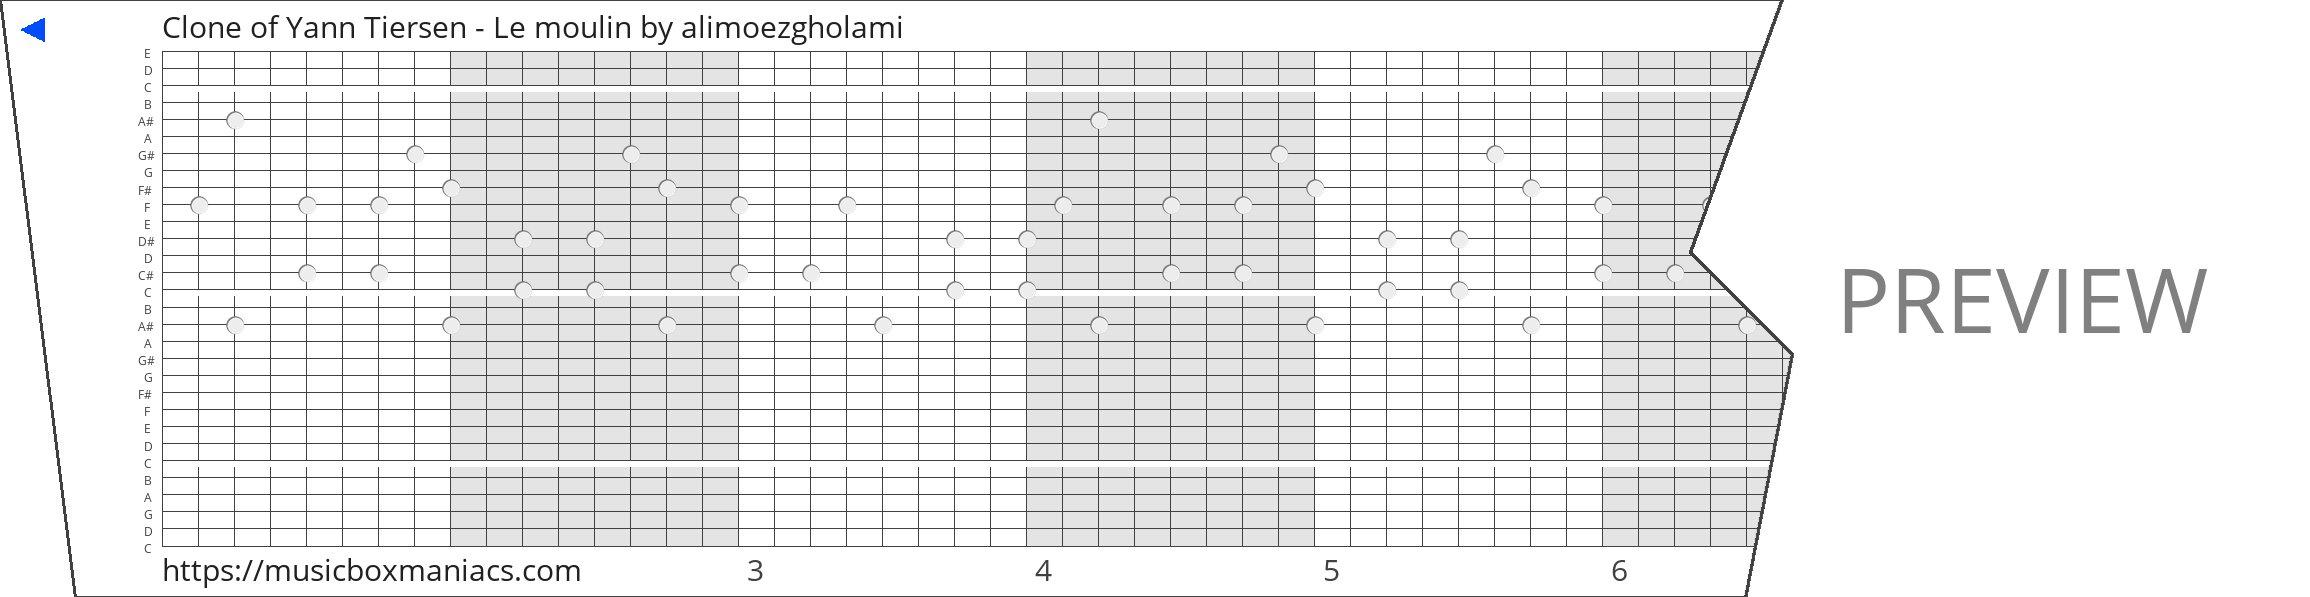 Clone of Yann Tiersen - Le moulin 30 note music box paper strip